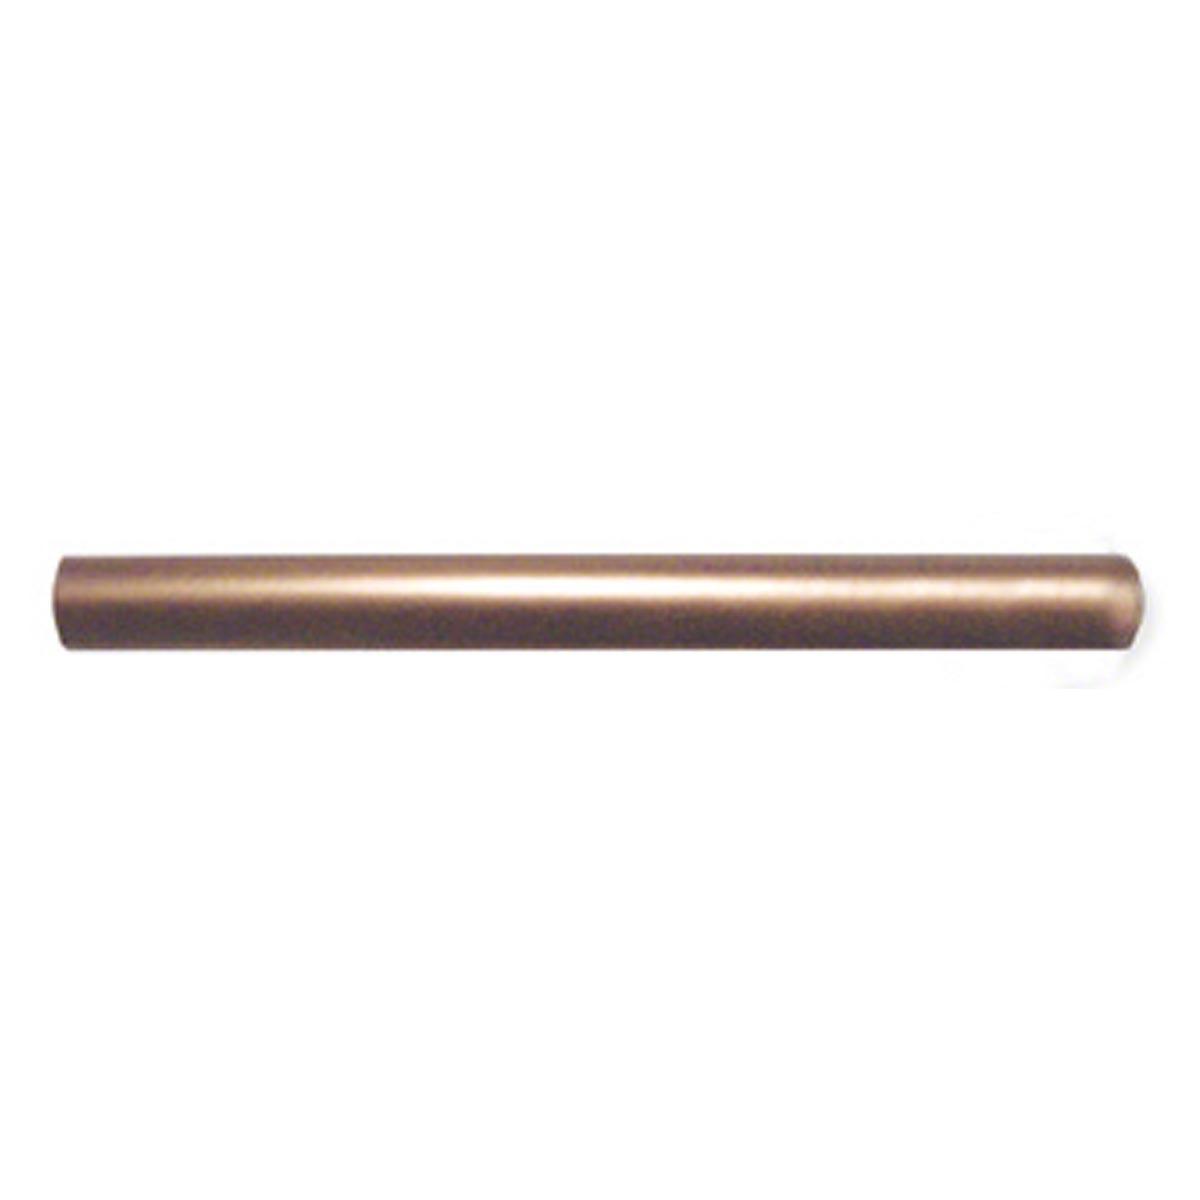 Copper Metal 0.5x6 Half Round Listello Molding